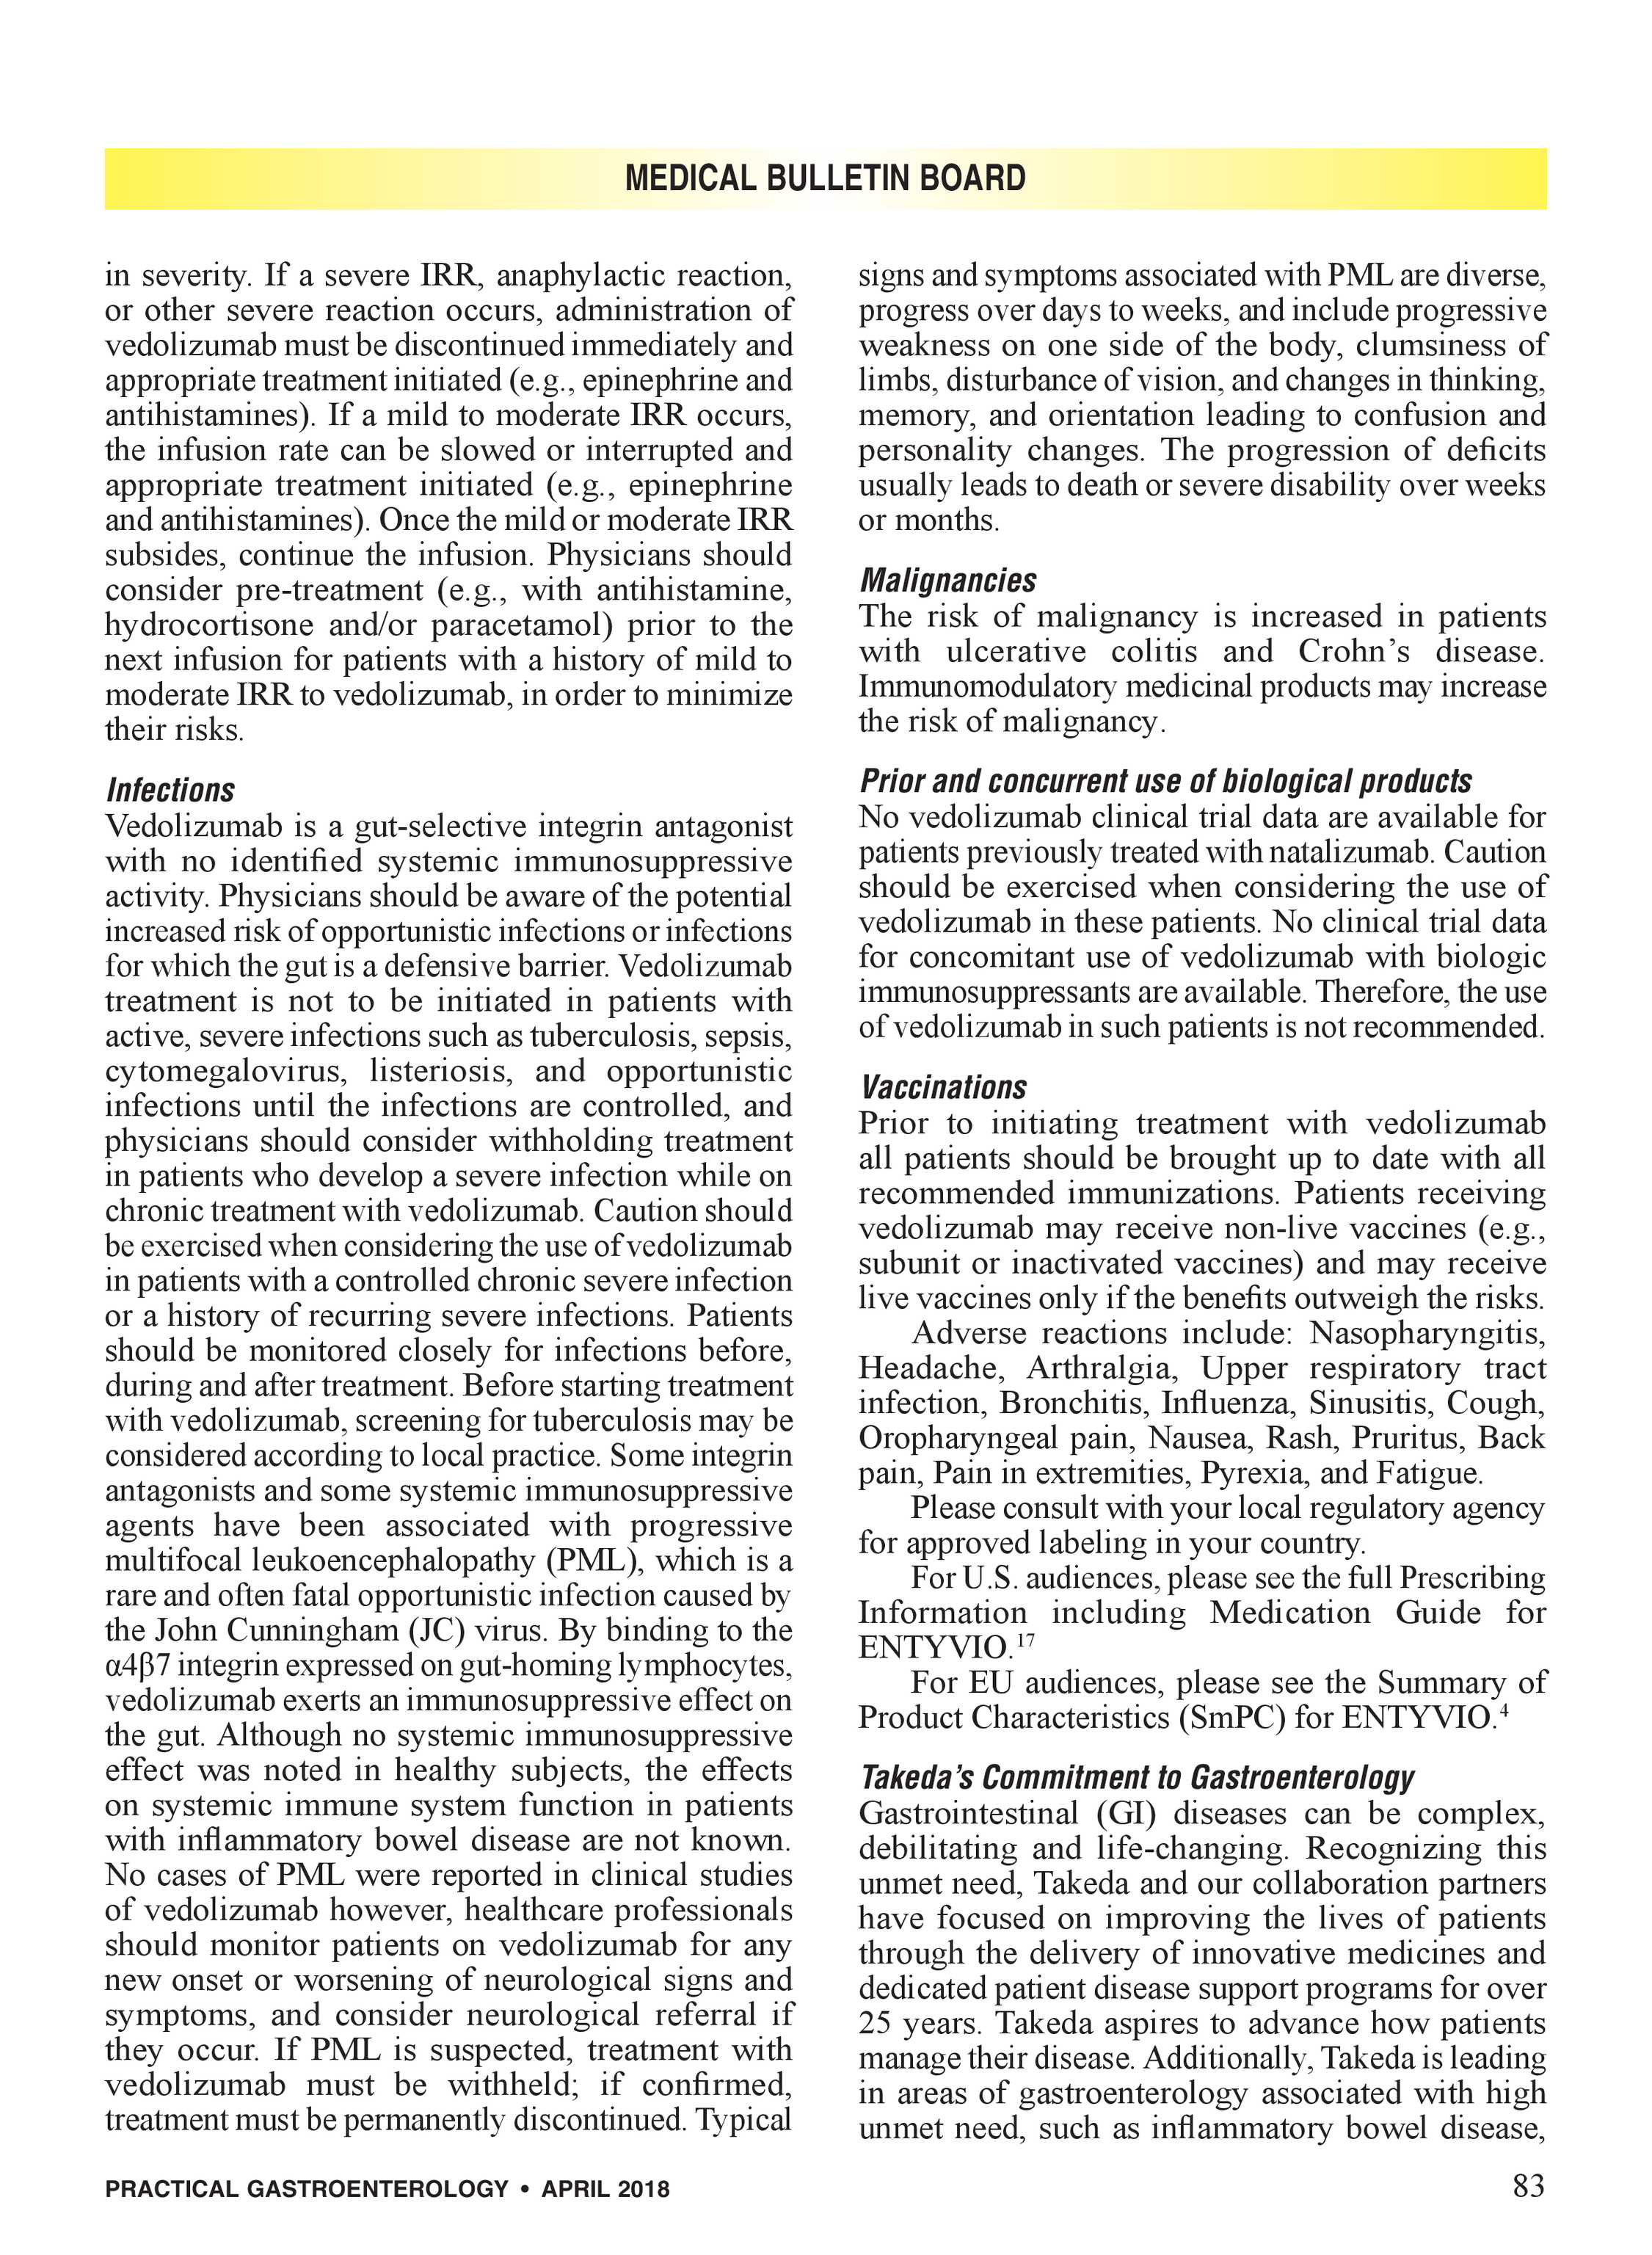 Practical Gastroenterology - April 2018 - page 83